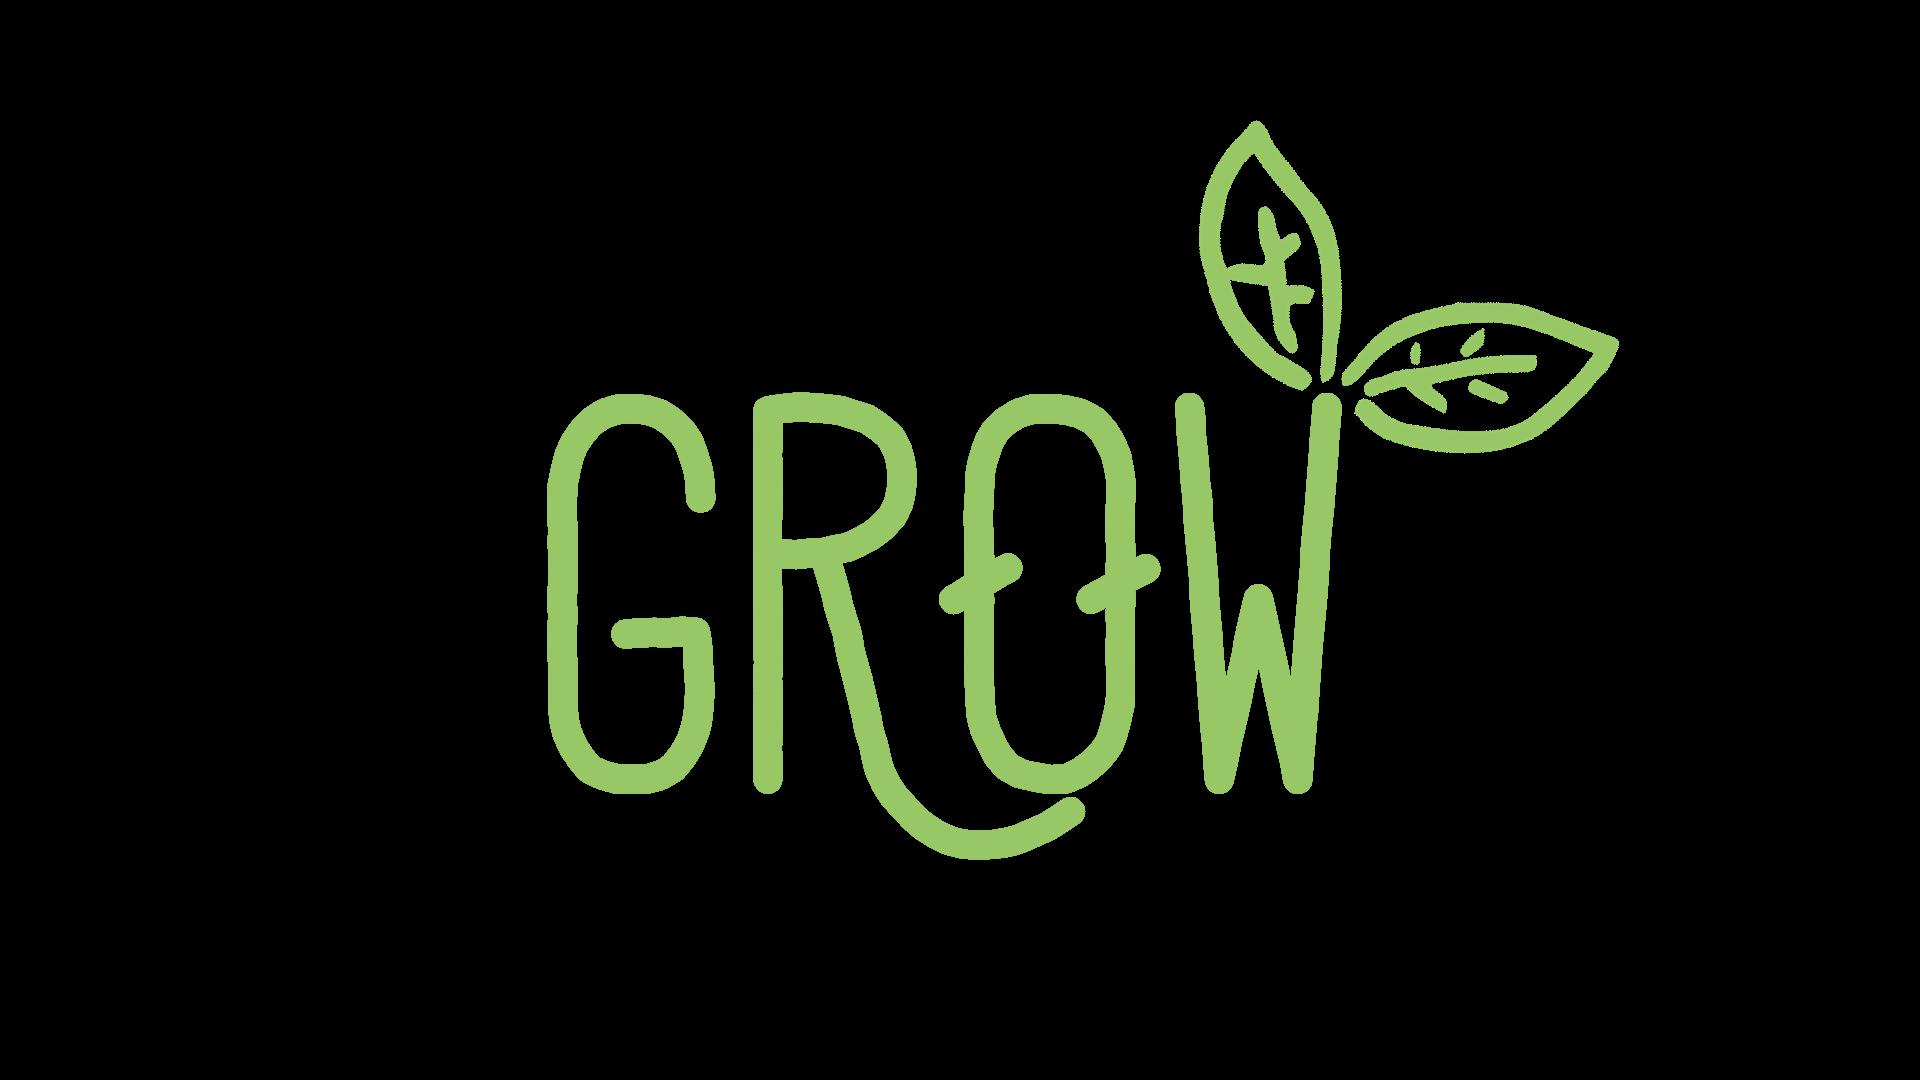 Confirmation 2019 logo